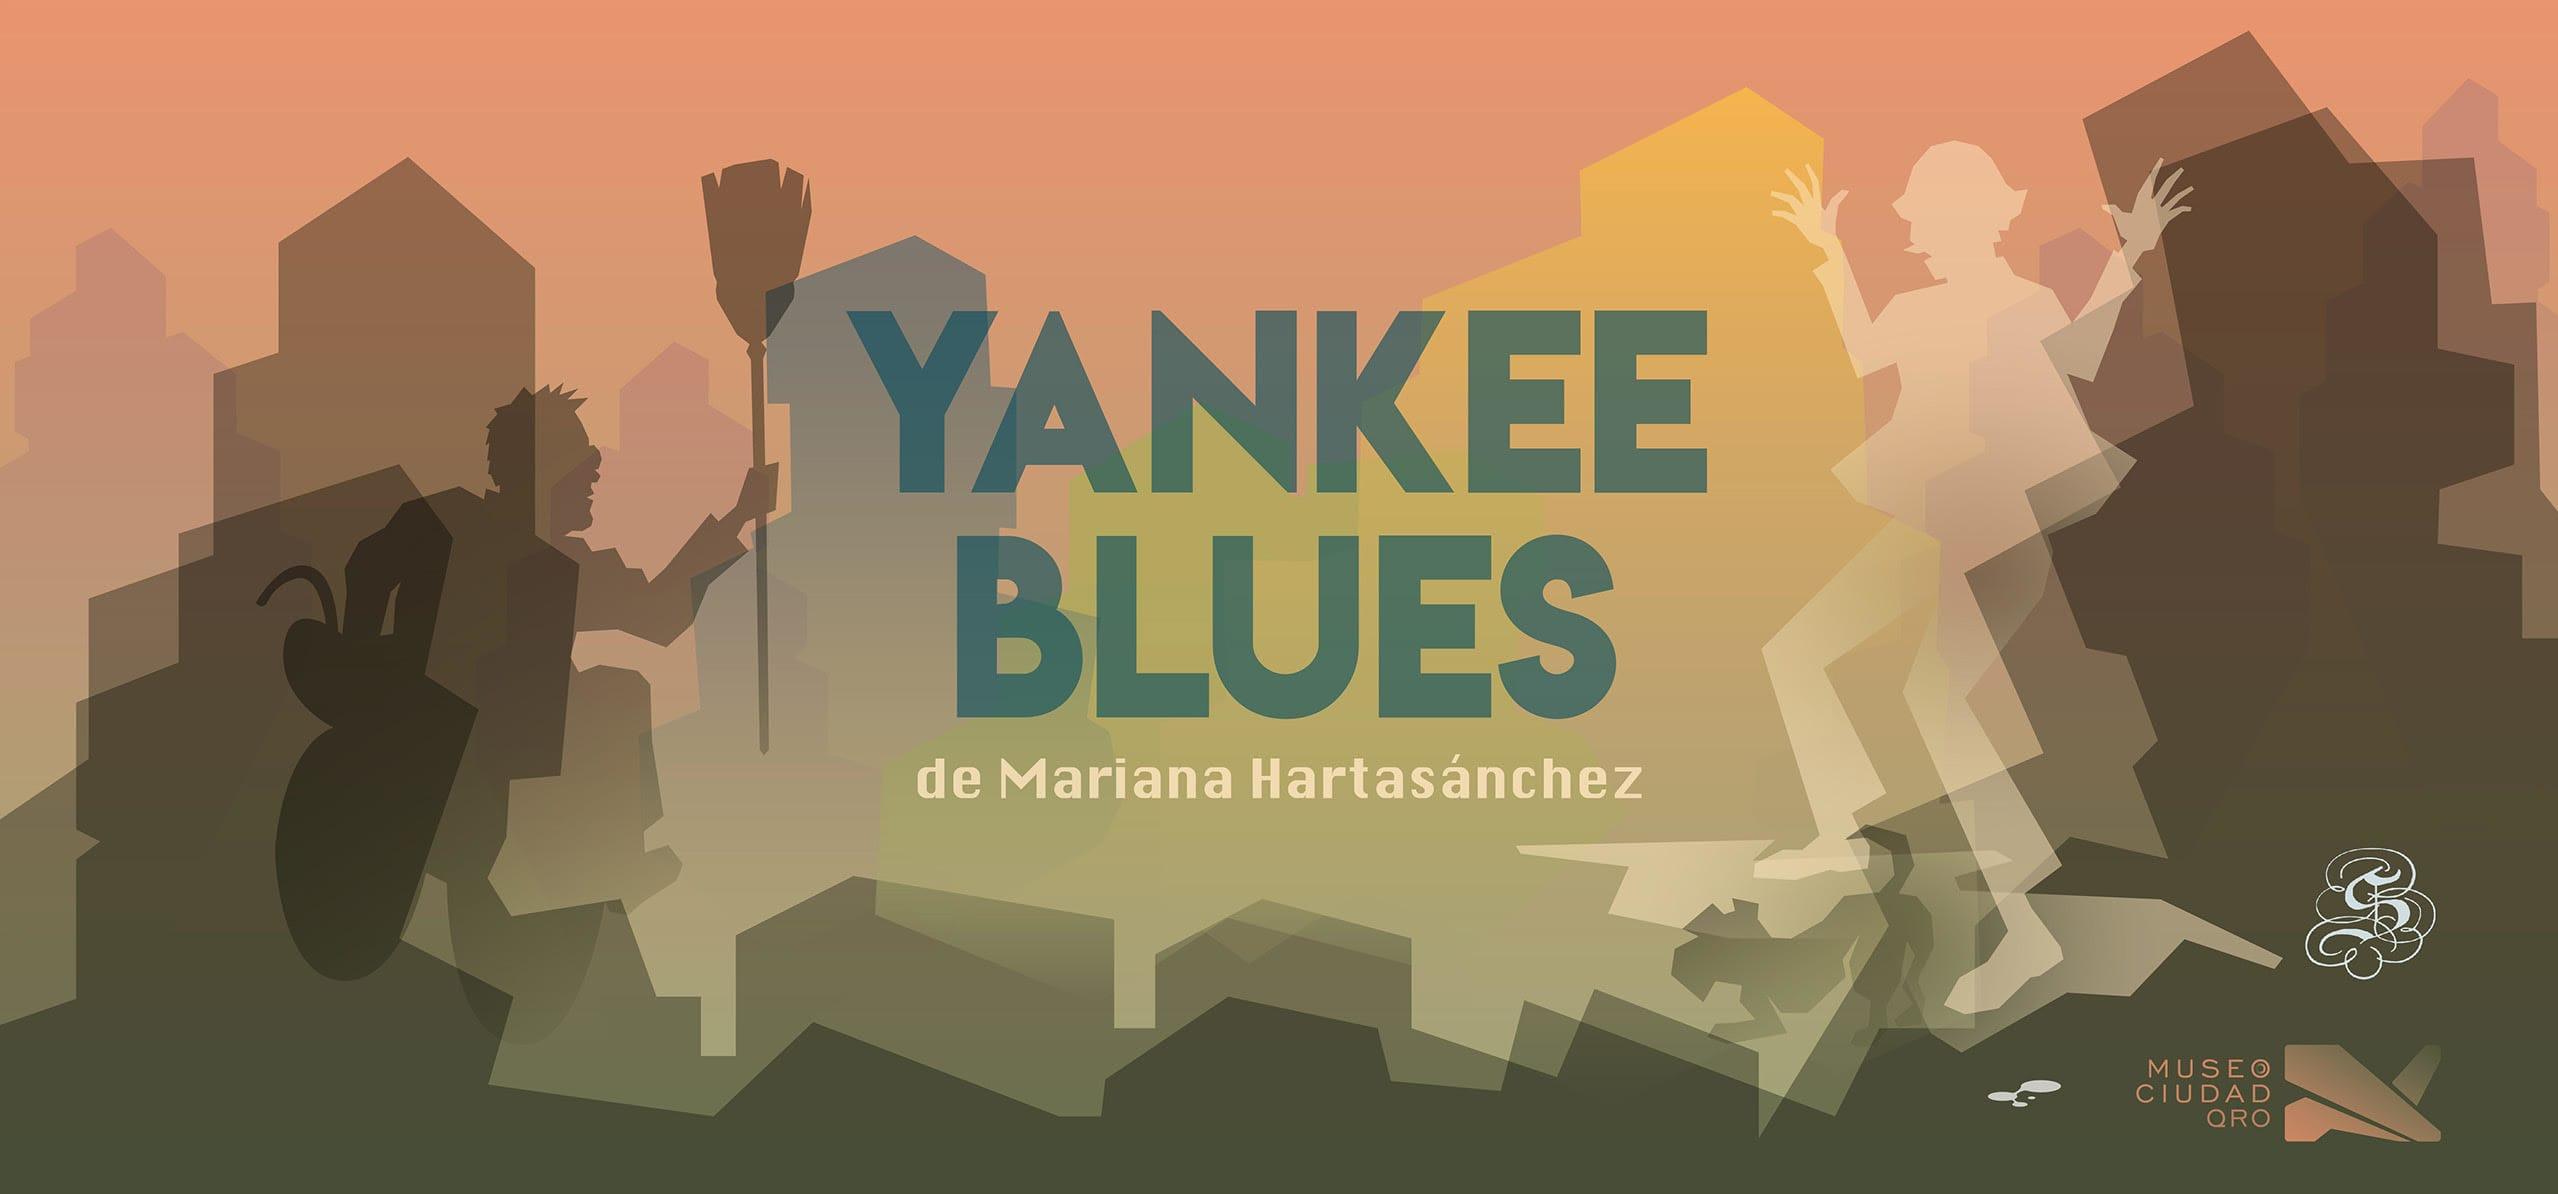 Yankee Blues 31 Julio